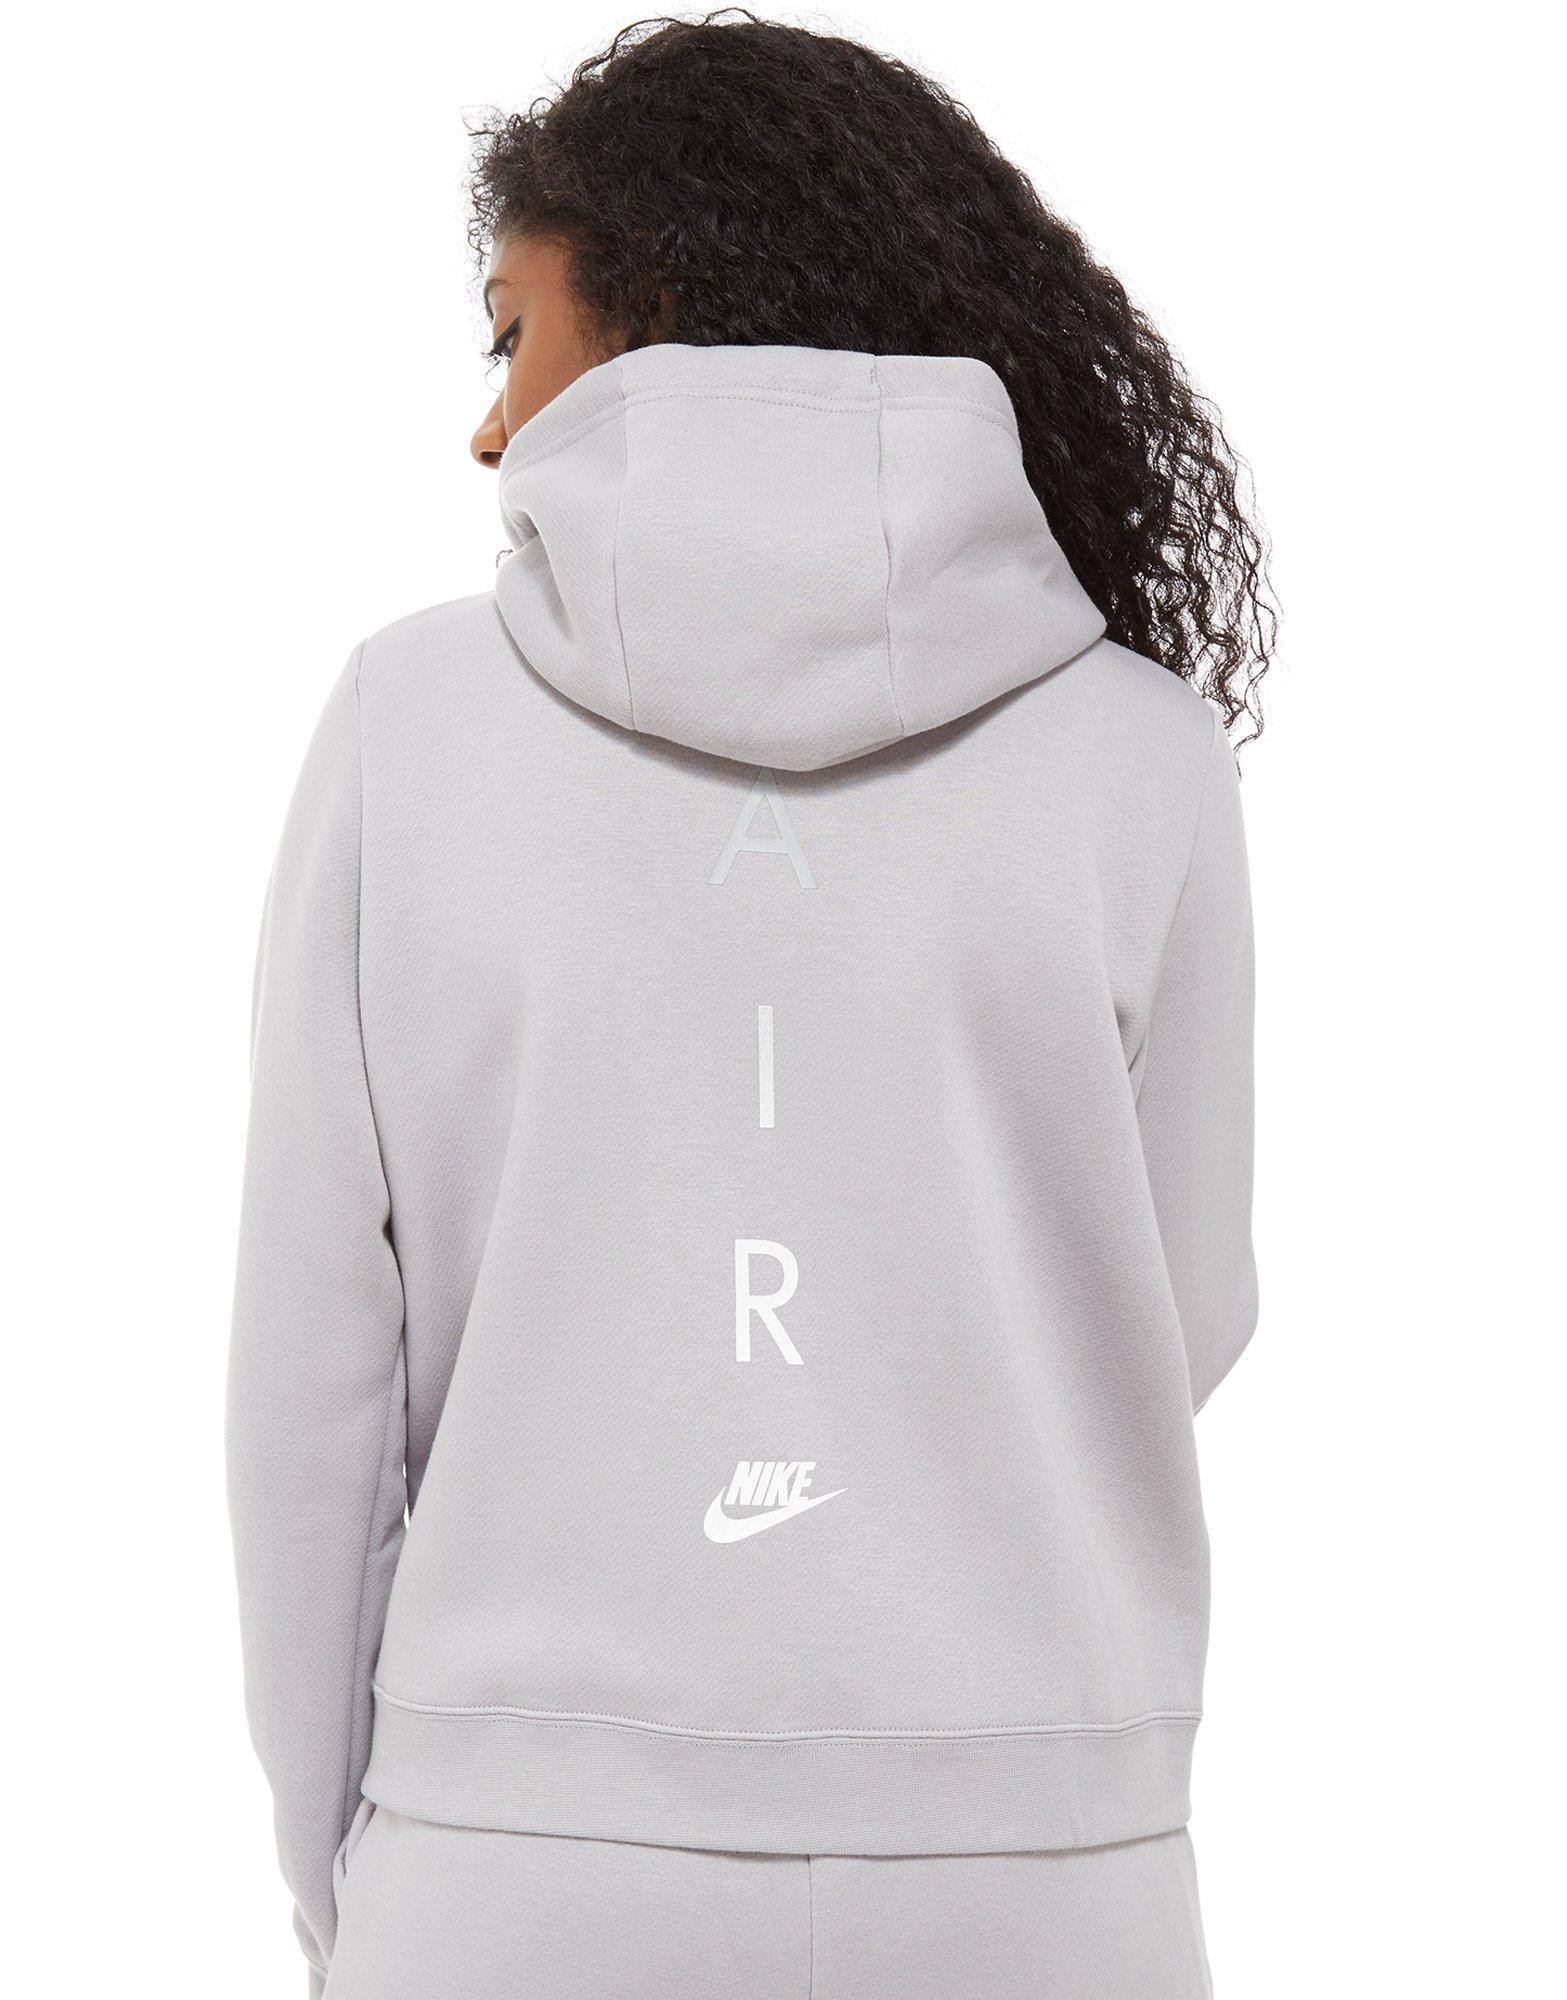 Nike Jd Sport Femme Veste 8zgowqx5z v0wynmN8O